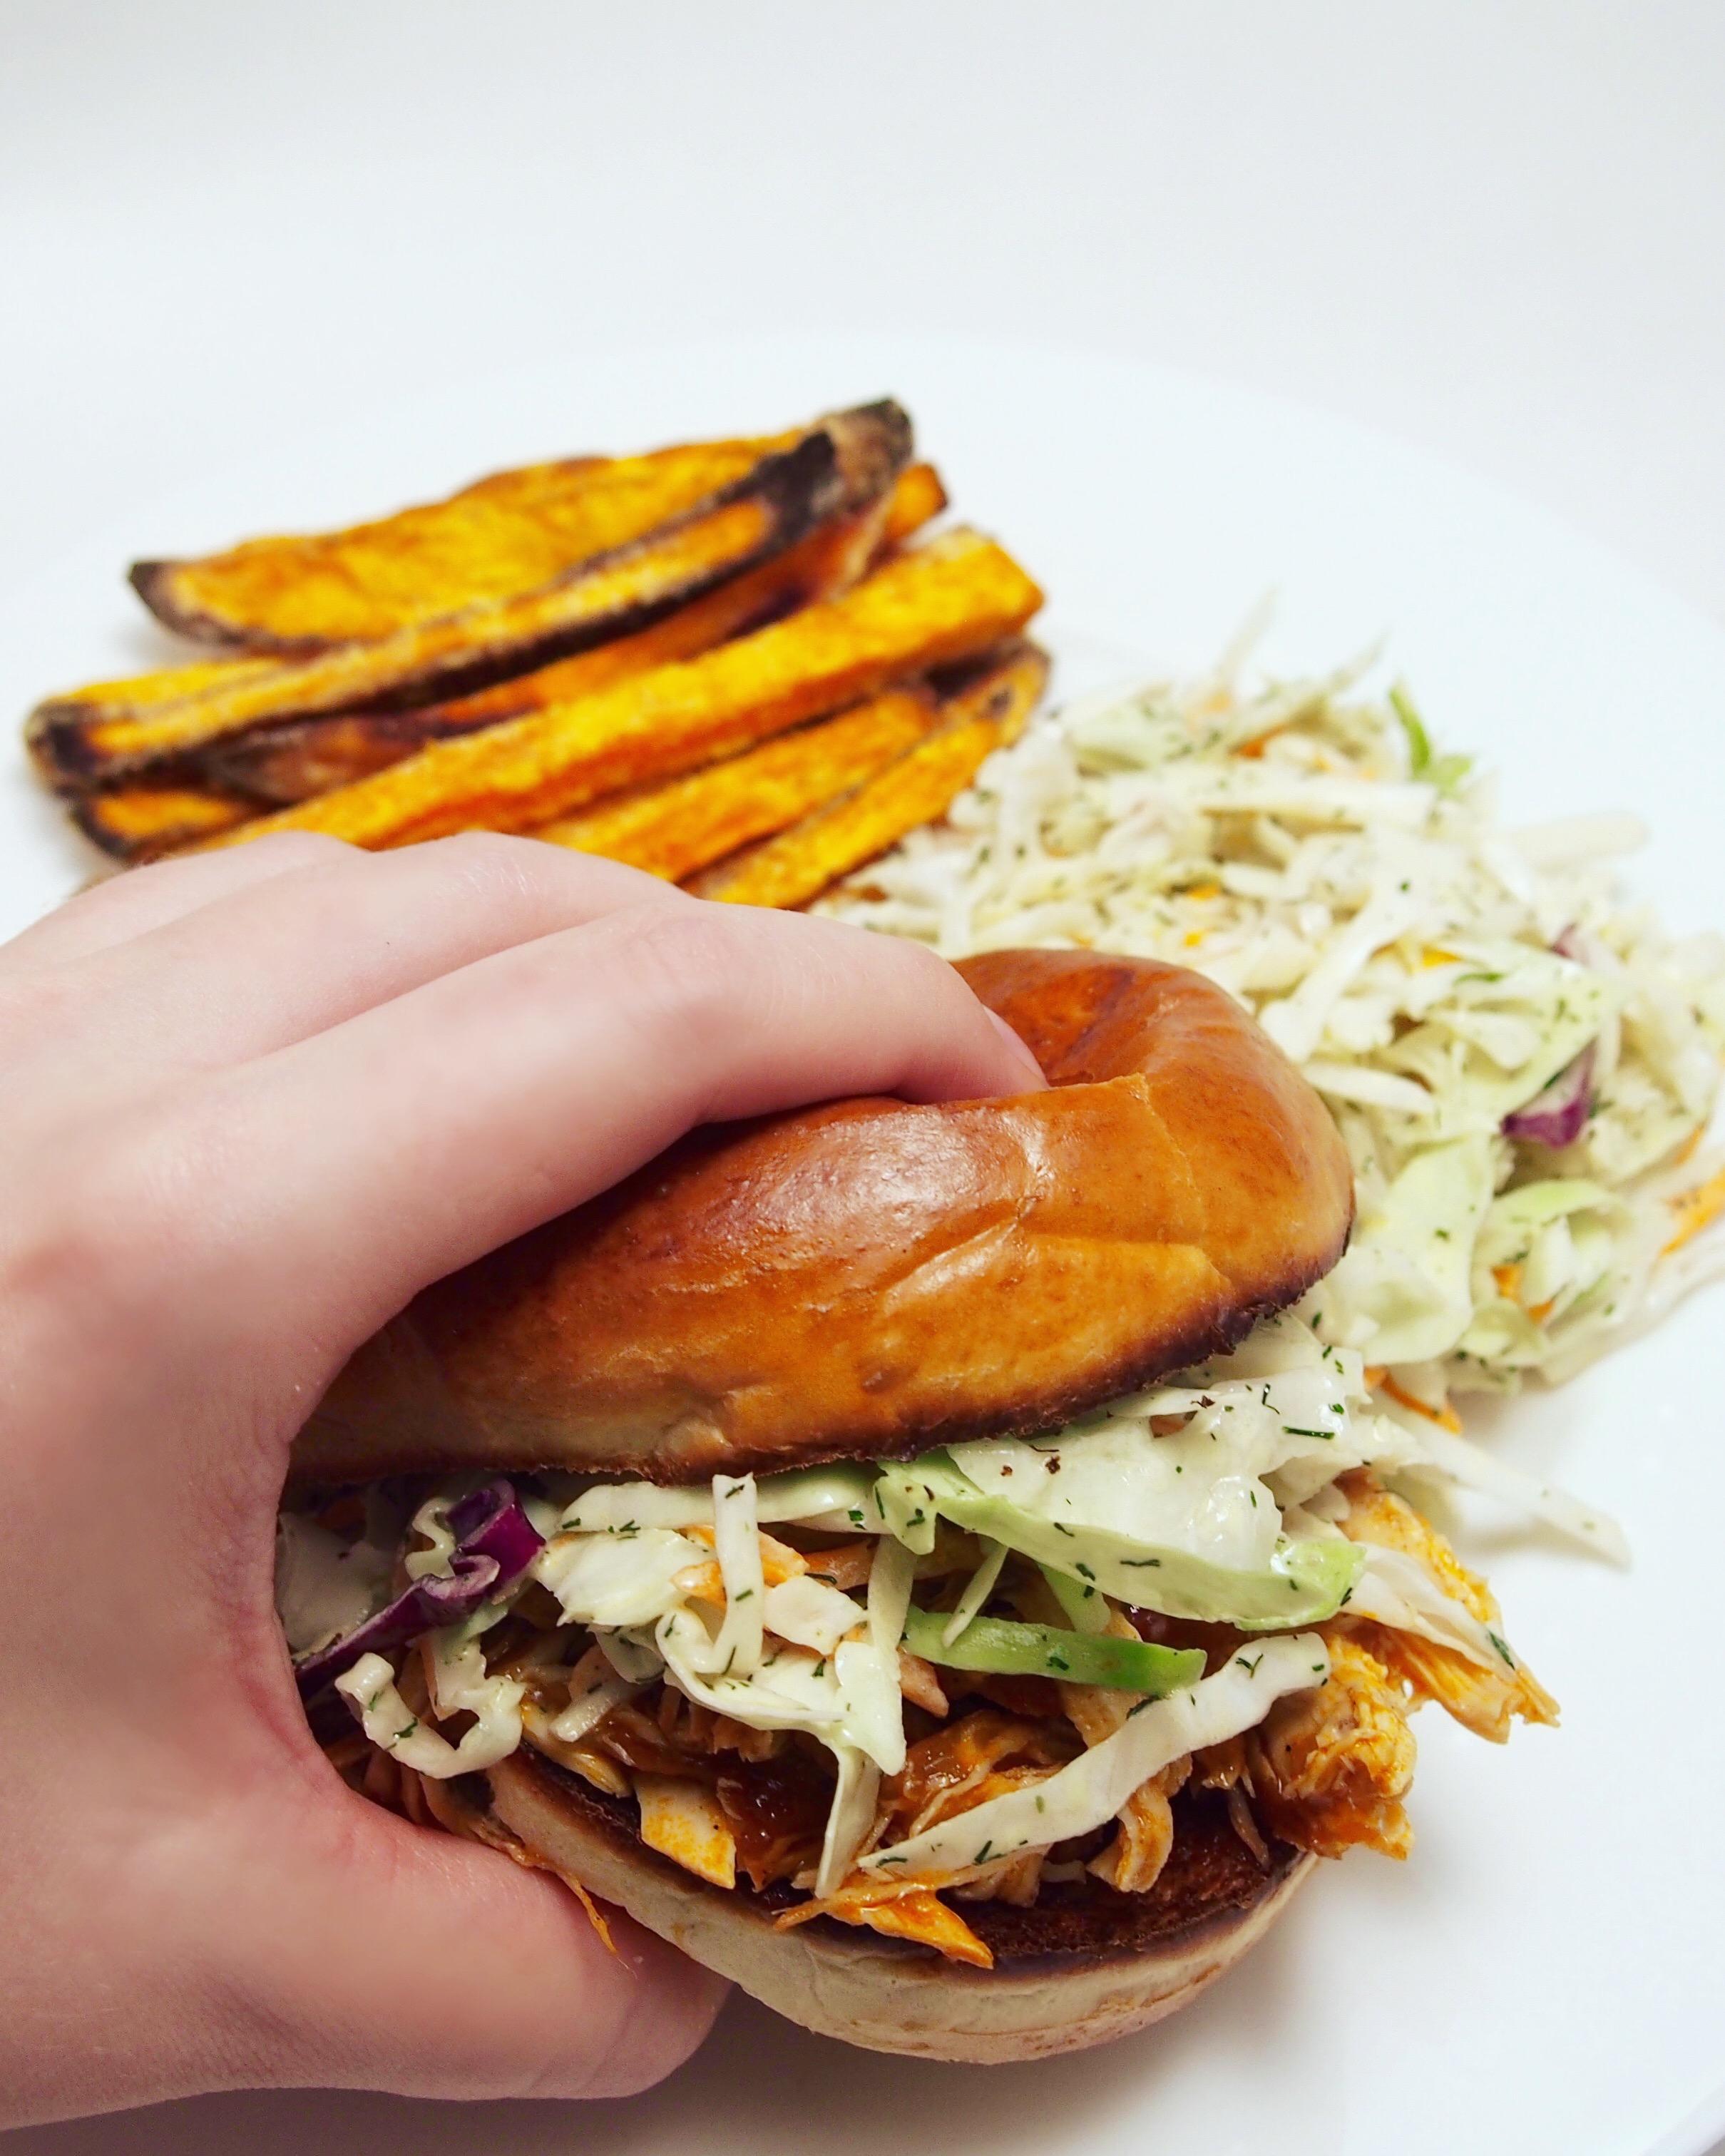 Instant Pot Buffalo Chicken Burgers Recipe. Registered Dietitian Nutritionist Recipes.